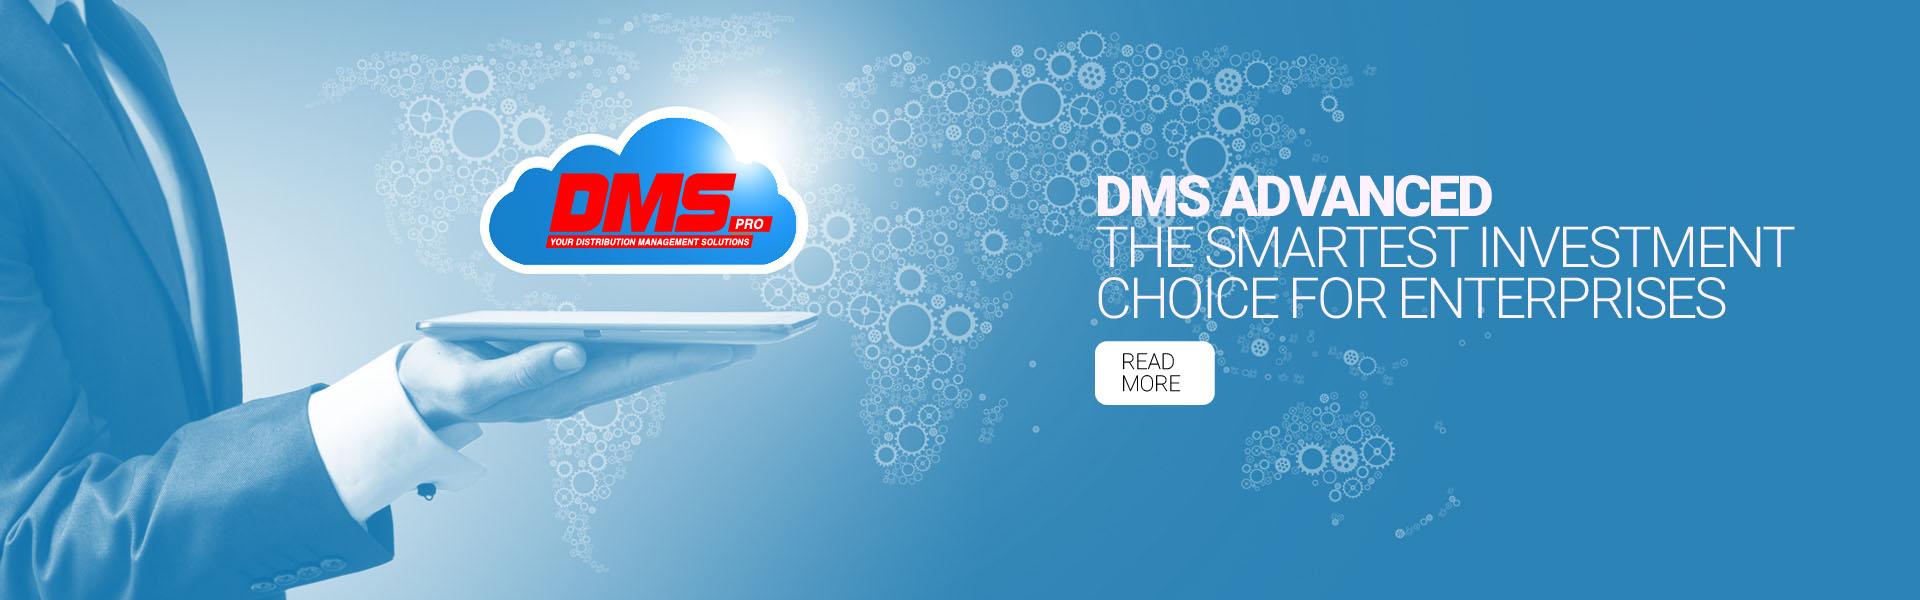 banner-dms-advanced